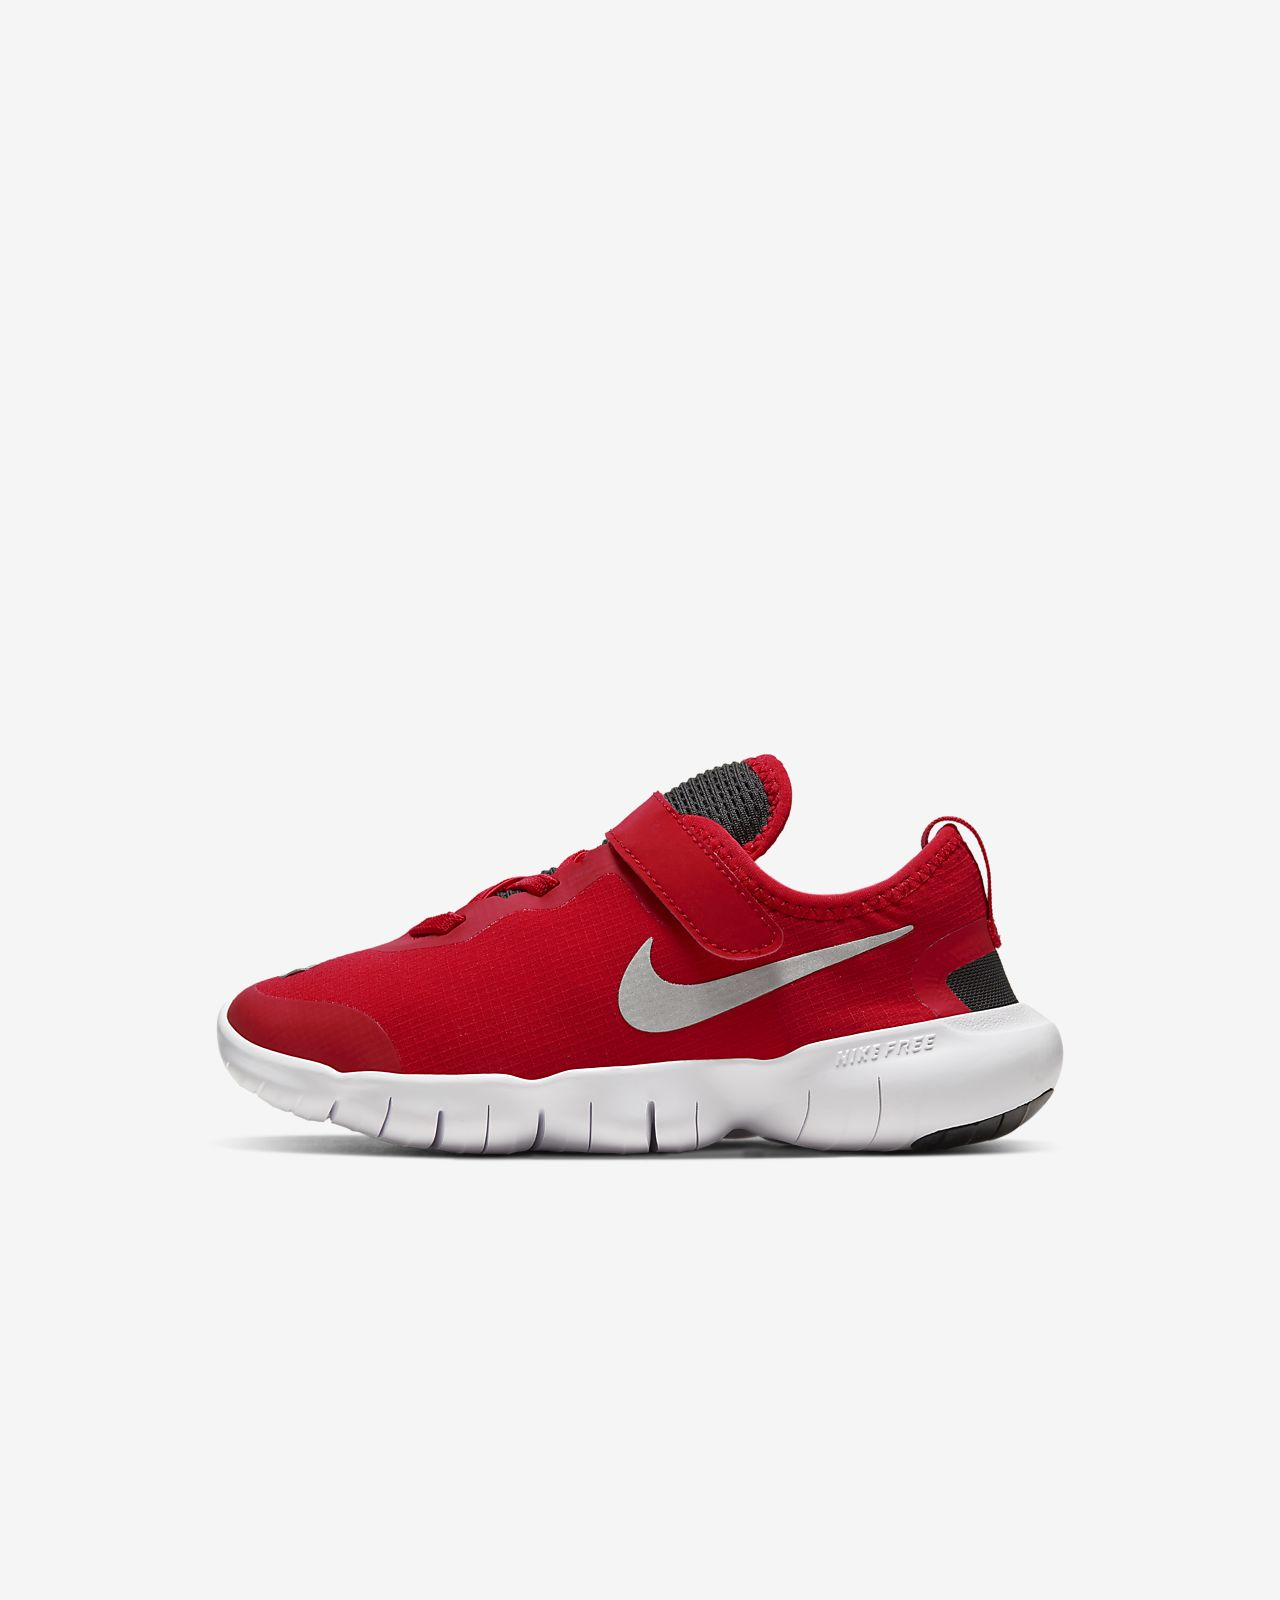 Nike Free RN 5.0 2020 (PSV) 幼童运动童鞋